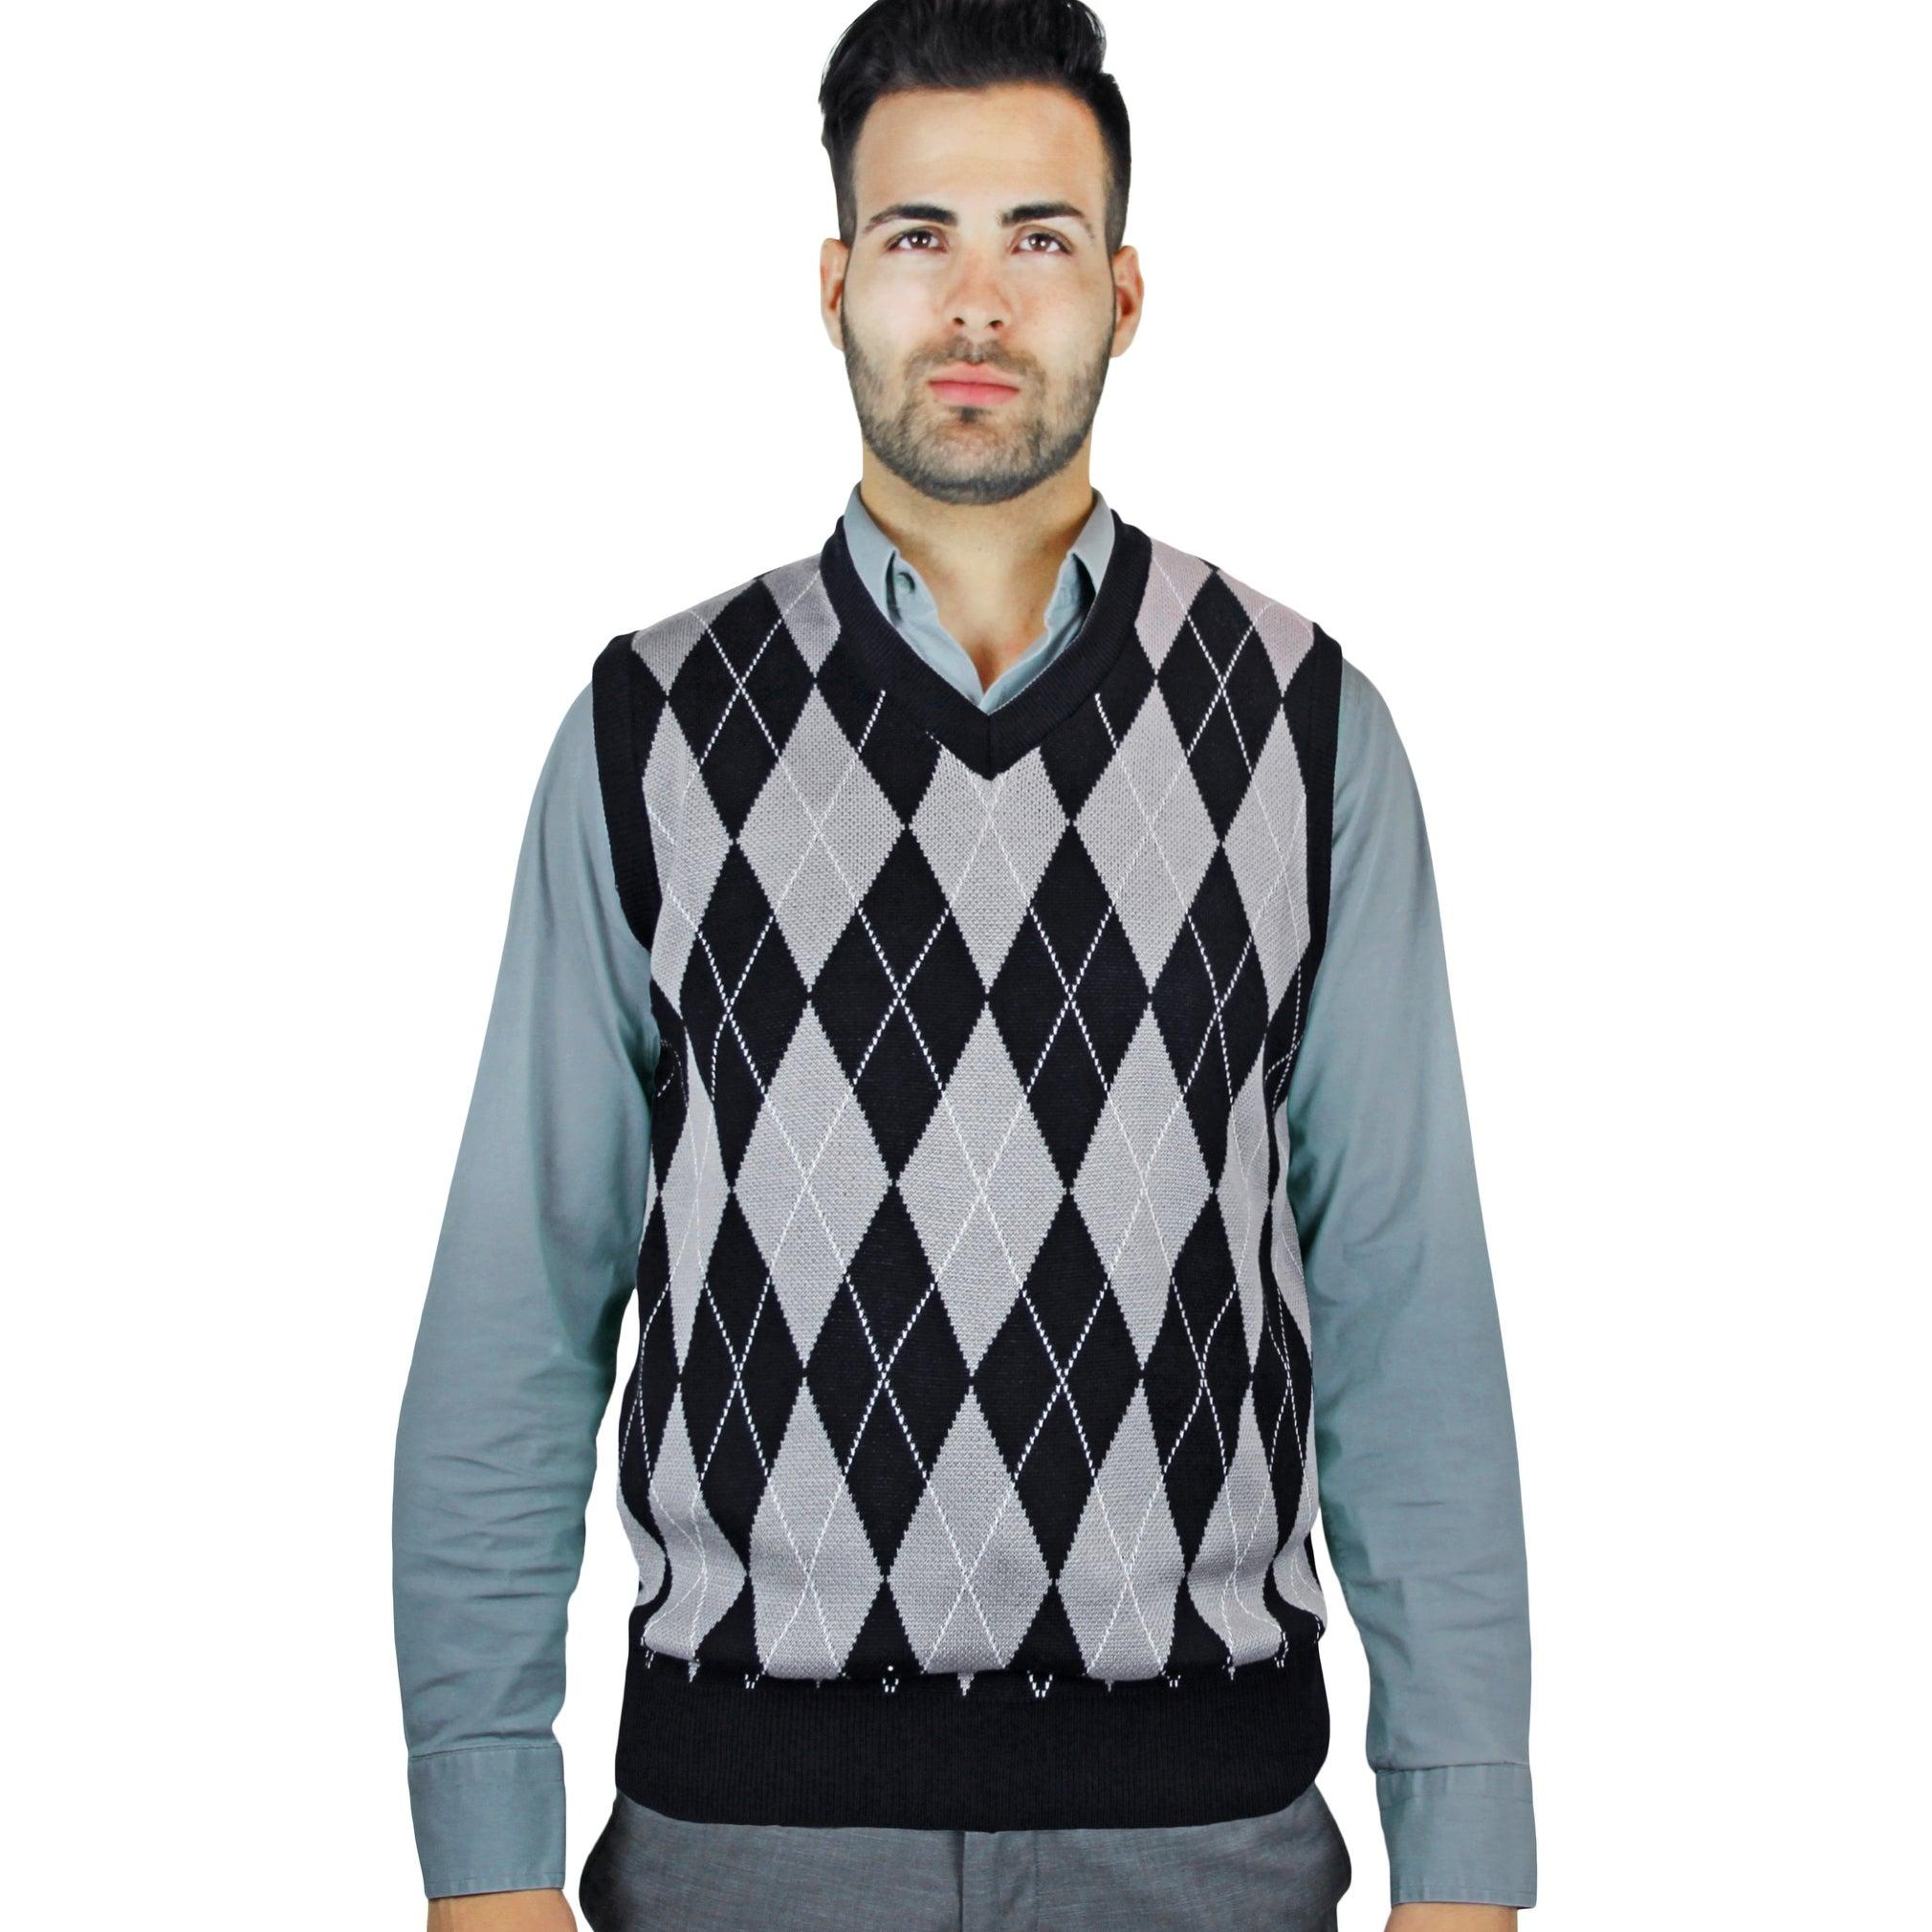 582416710 Shop Men s Jacquard Argyle Sweater Vest (SV-245) - Free Shipping On ...